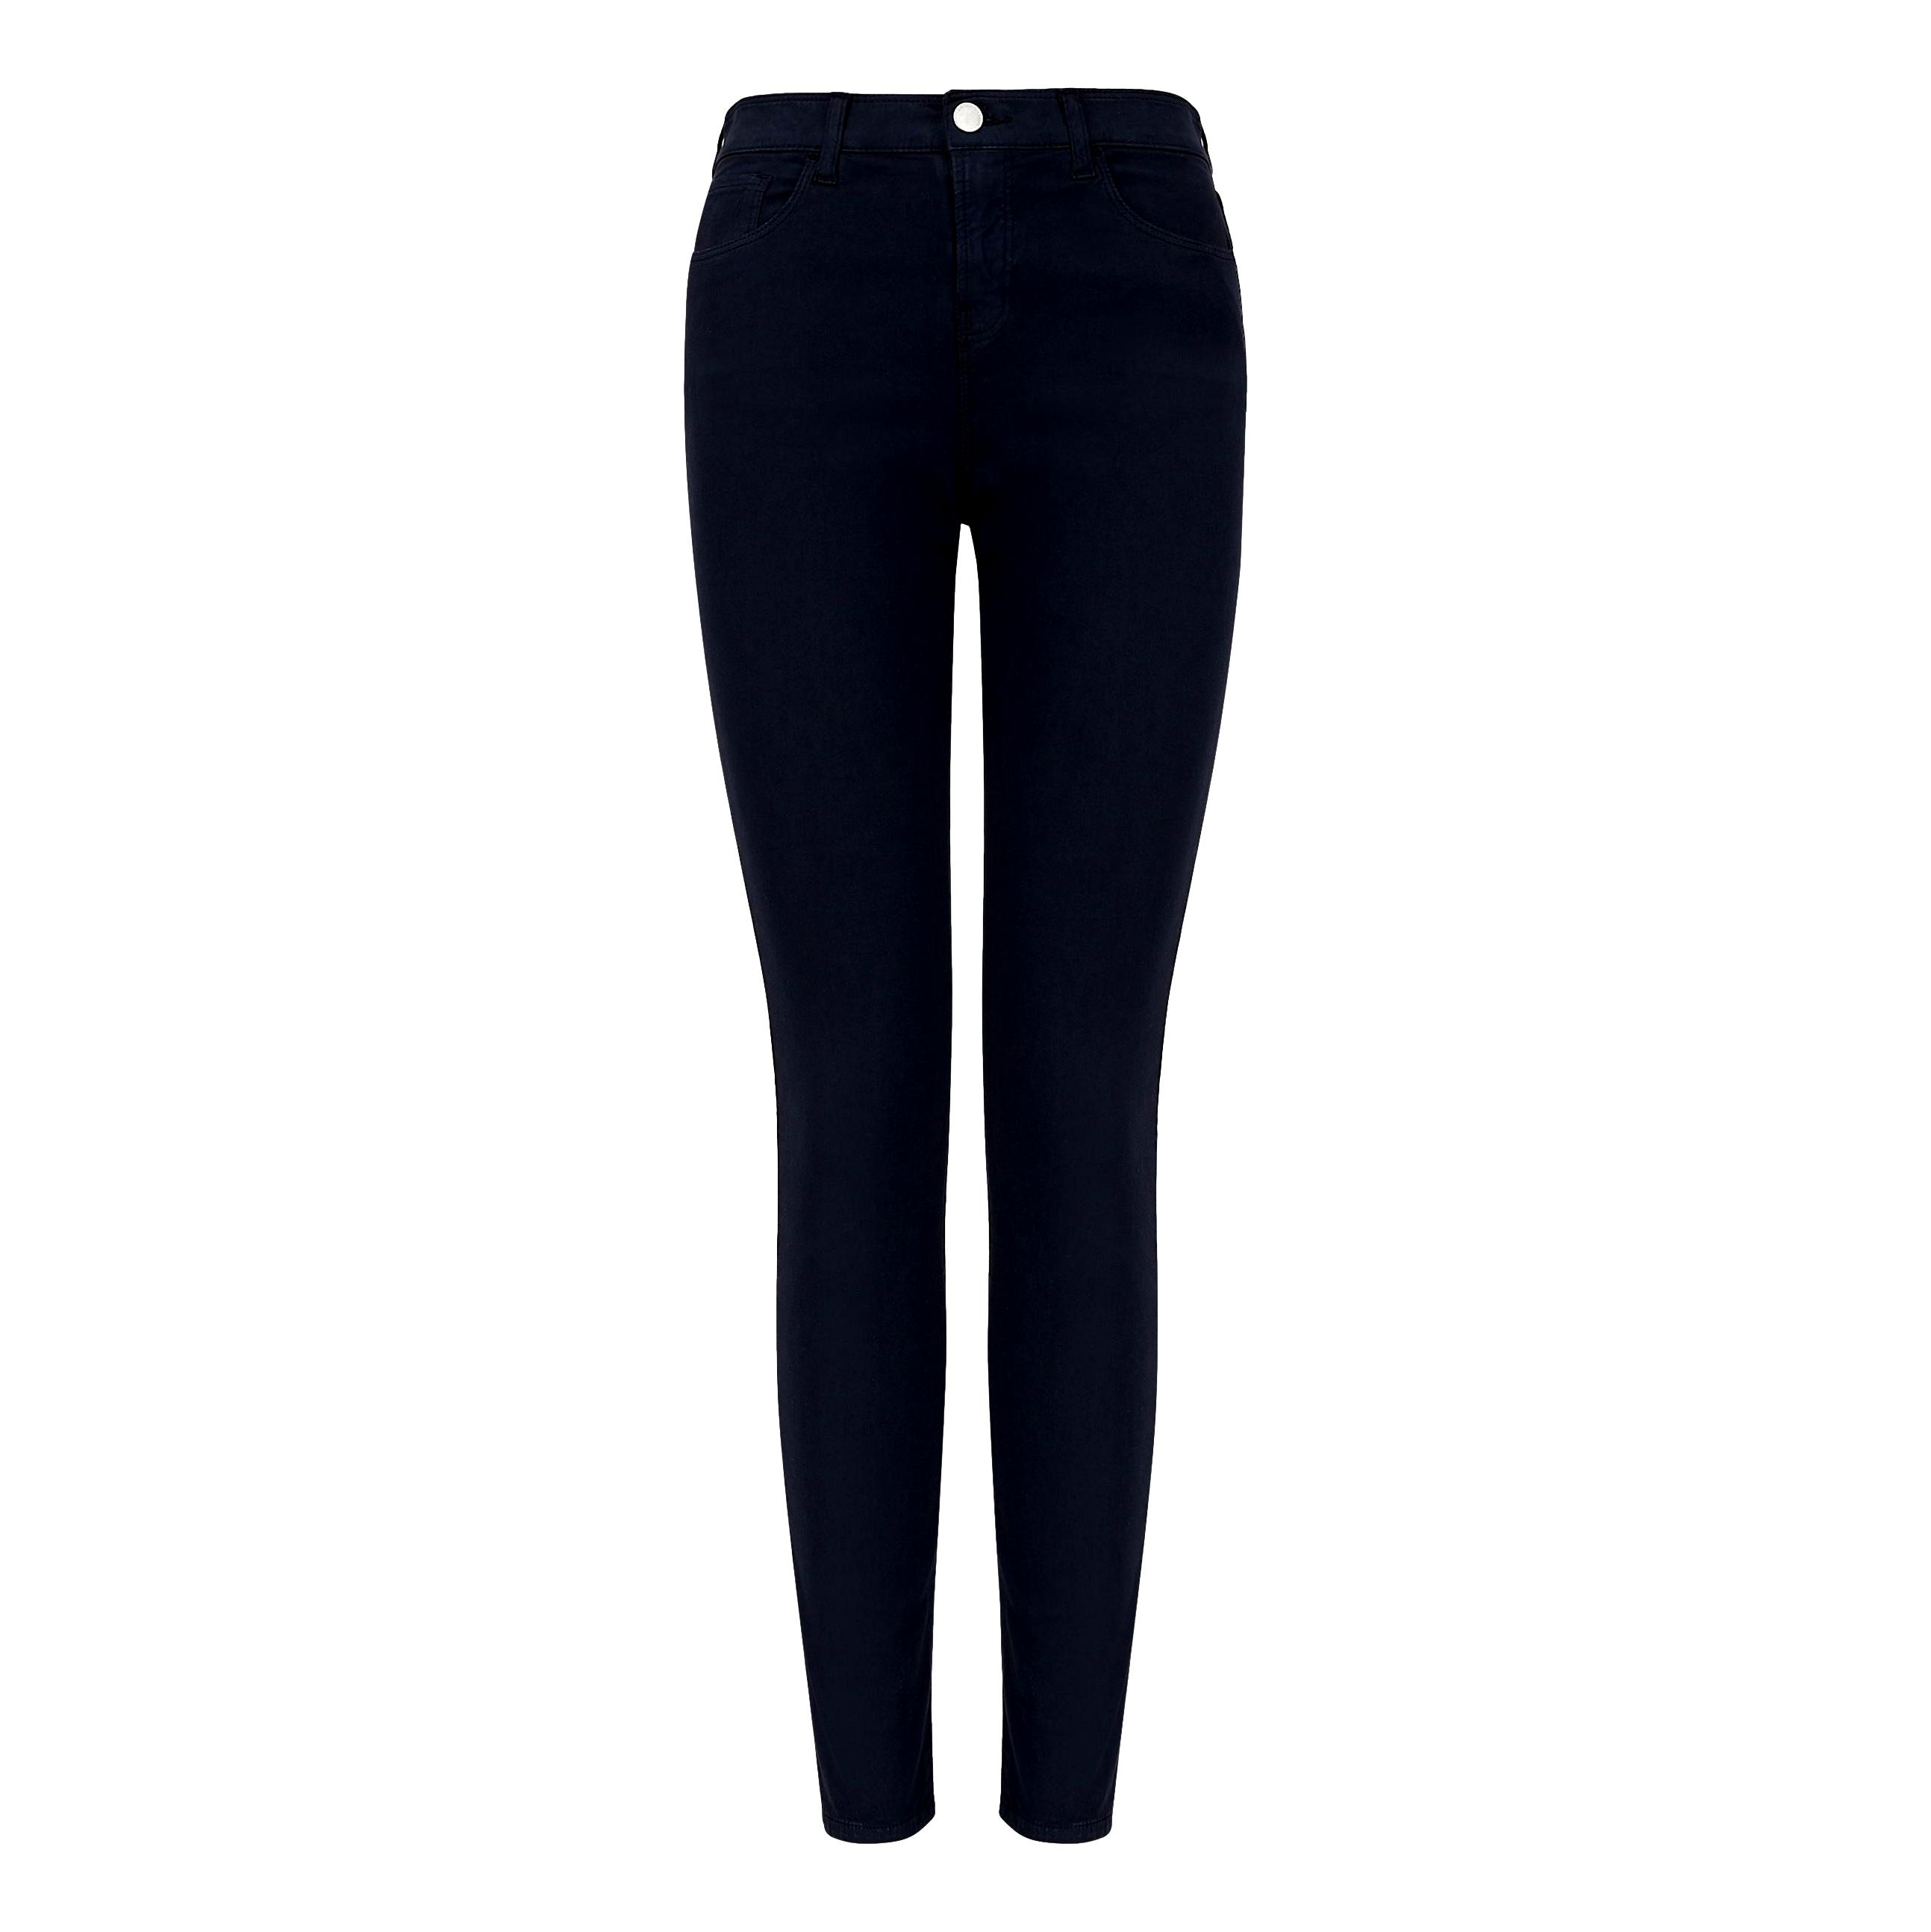 J20 skinny fit jeans in comfort denim dyed mineral garment EMPORIO ARMANI |  | 3K2J20 2N8HZ0926